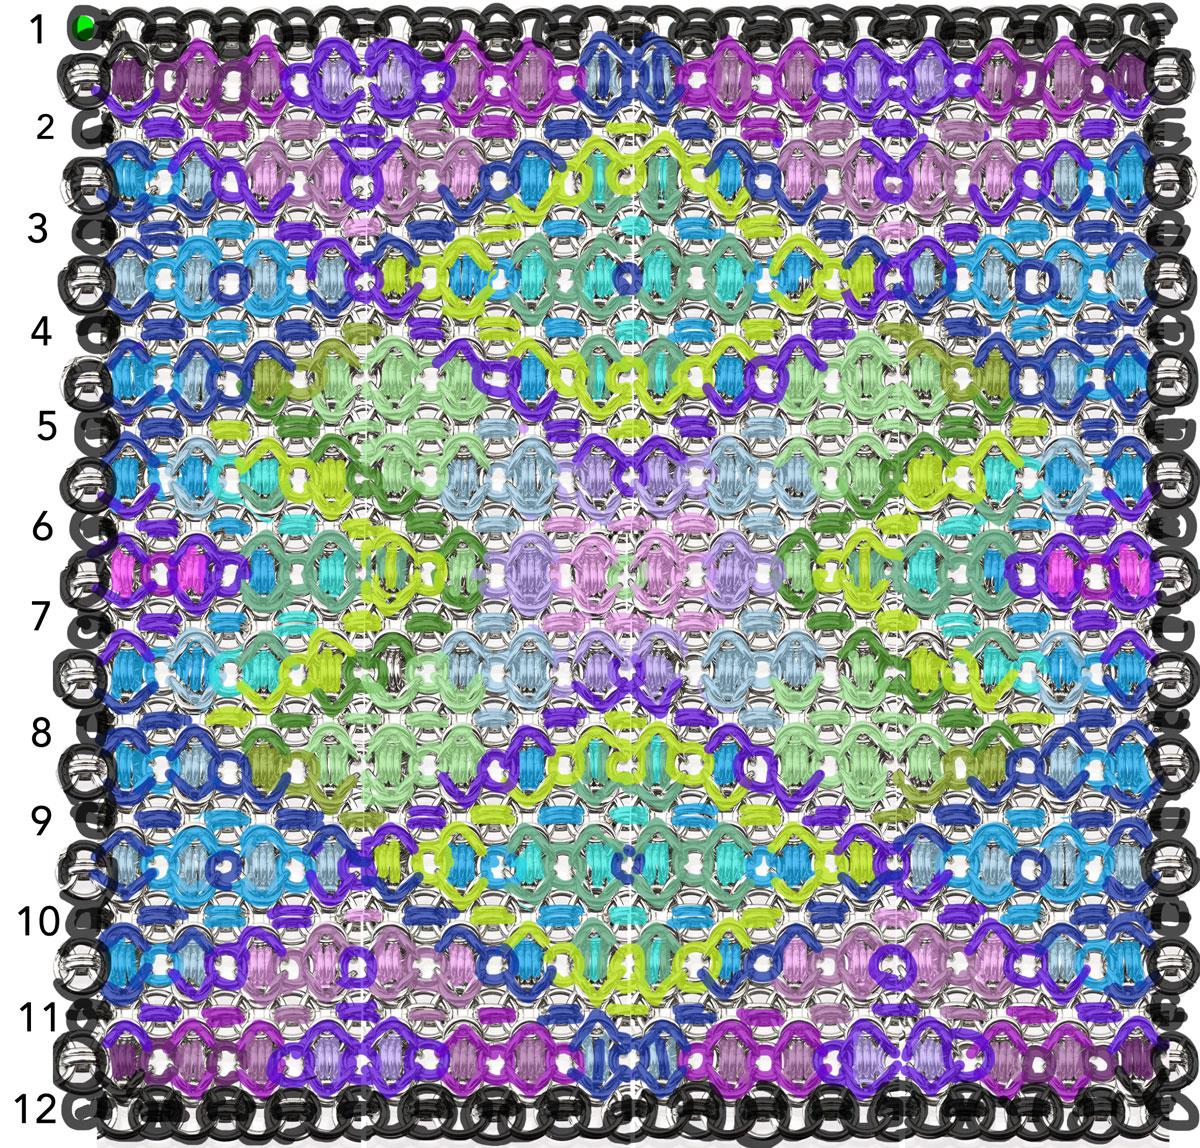 rondo-a-la-byzantine-sheet-colored